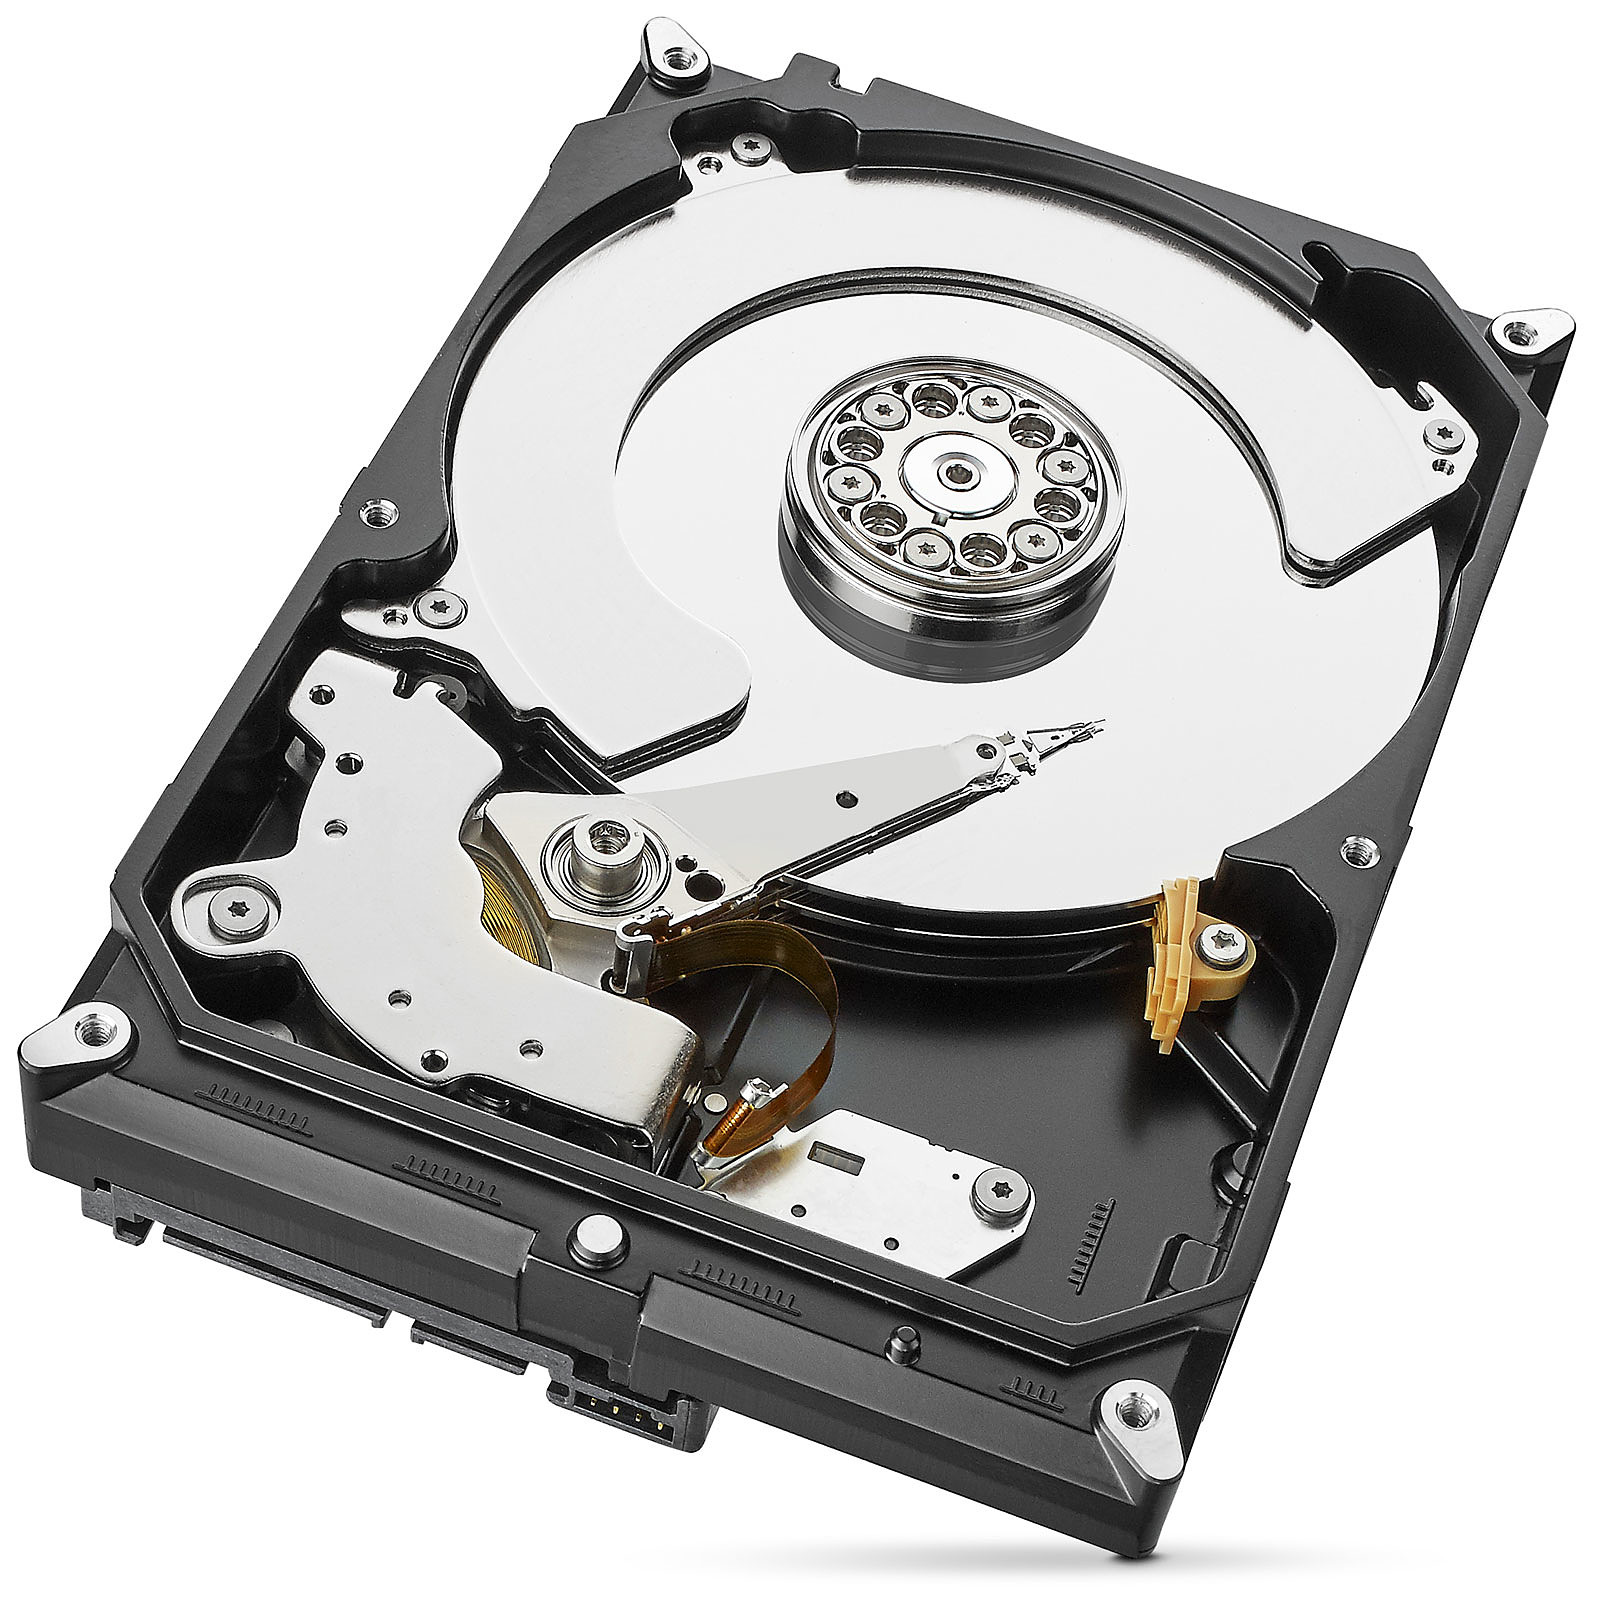 Disque dur Seagate Desktop 3 To SATA 3 (SATA 6Gb/s) 256 Mo 5400 trs/mn (bulk), informatique ile de la Réunion 974